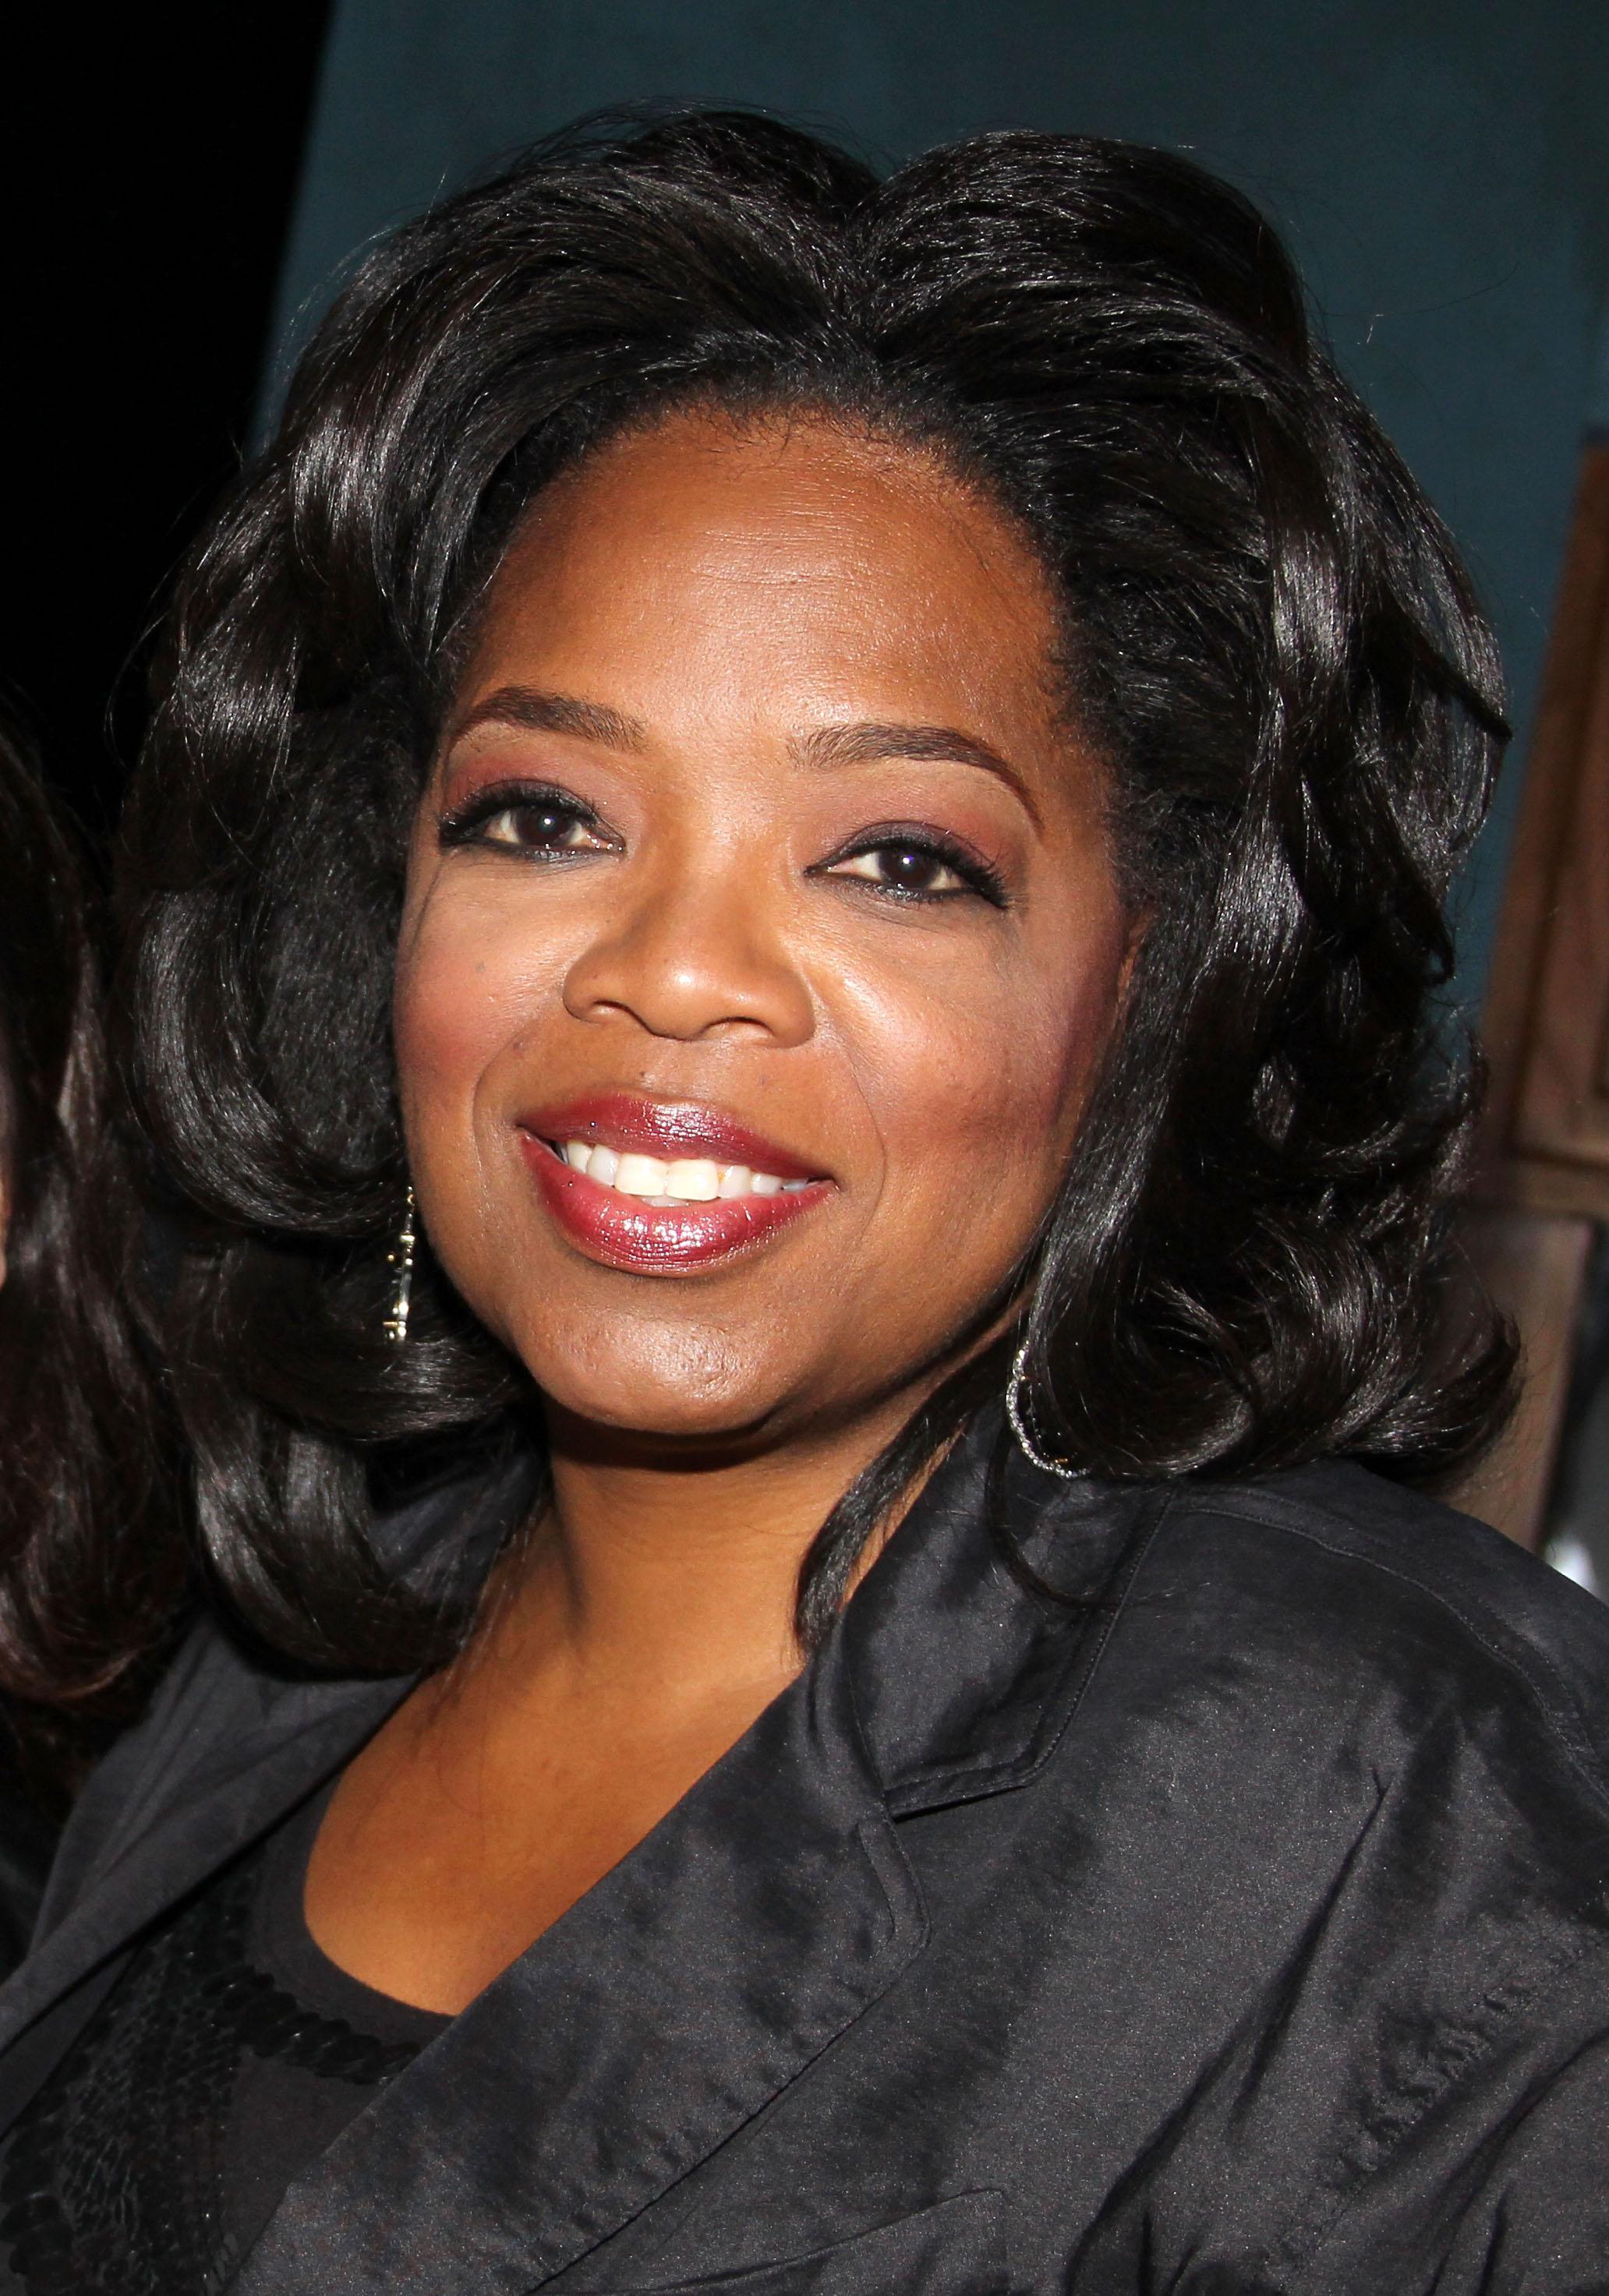 Celebrities Visit Broadway - April 30, 2011